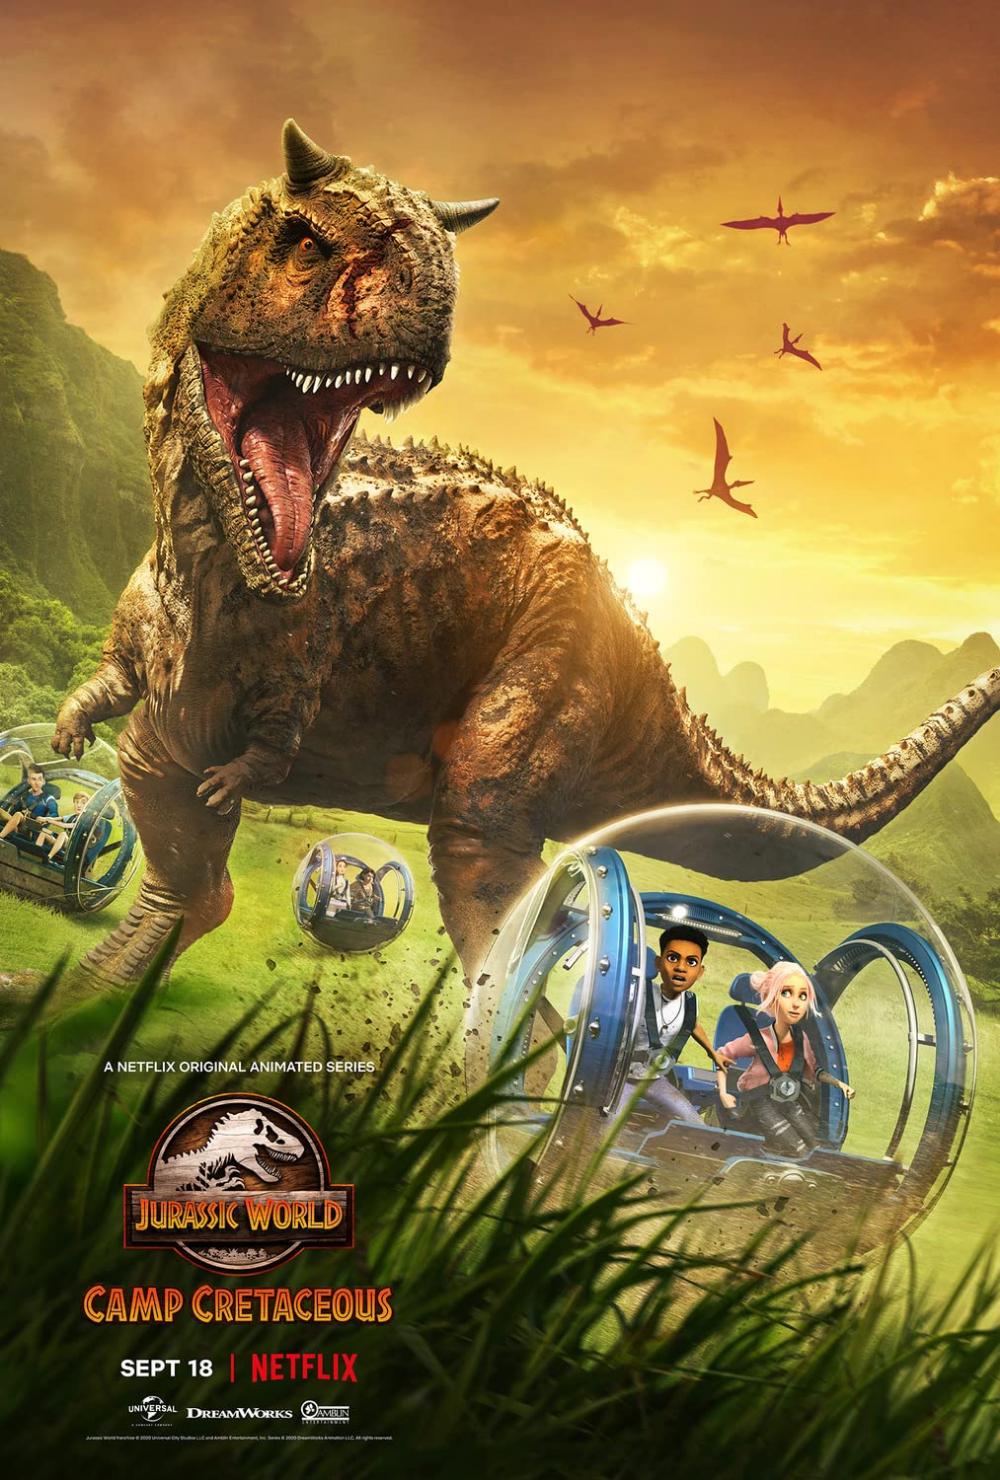 Latest Posters Jurassic World Jurassic World Dinosaurs Jurassic Park World